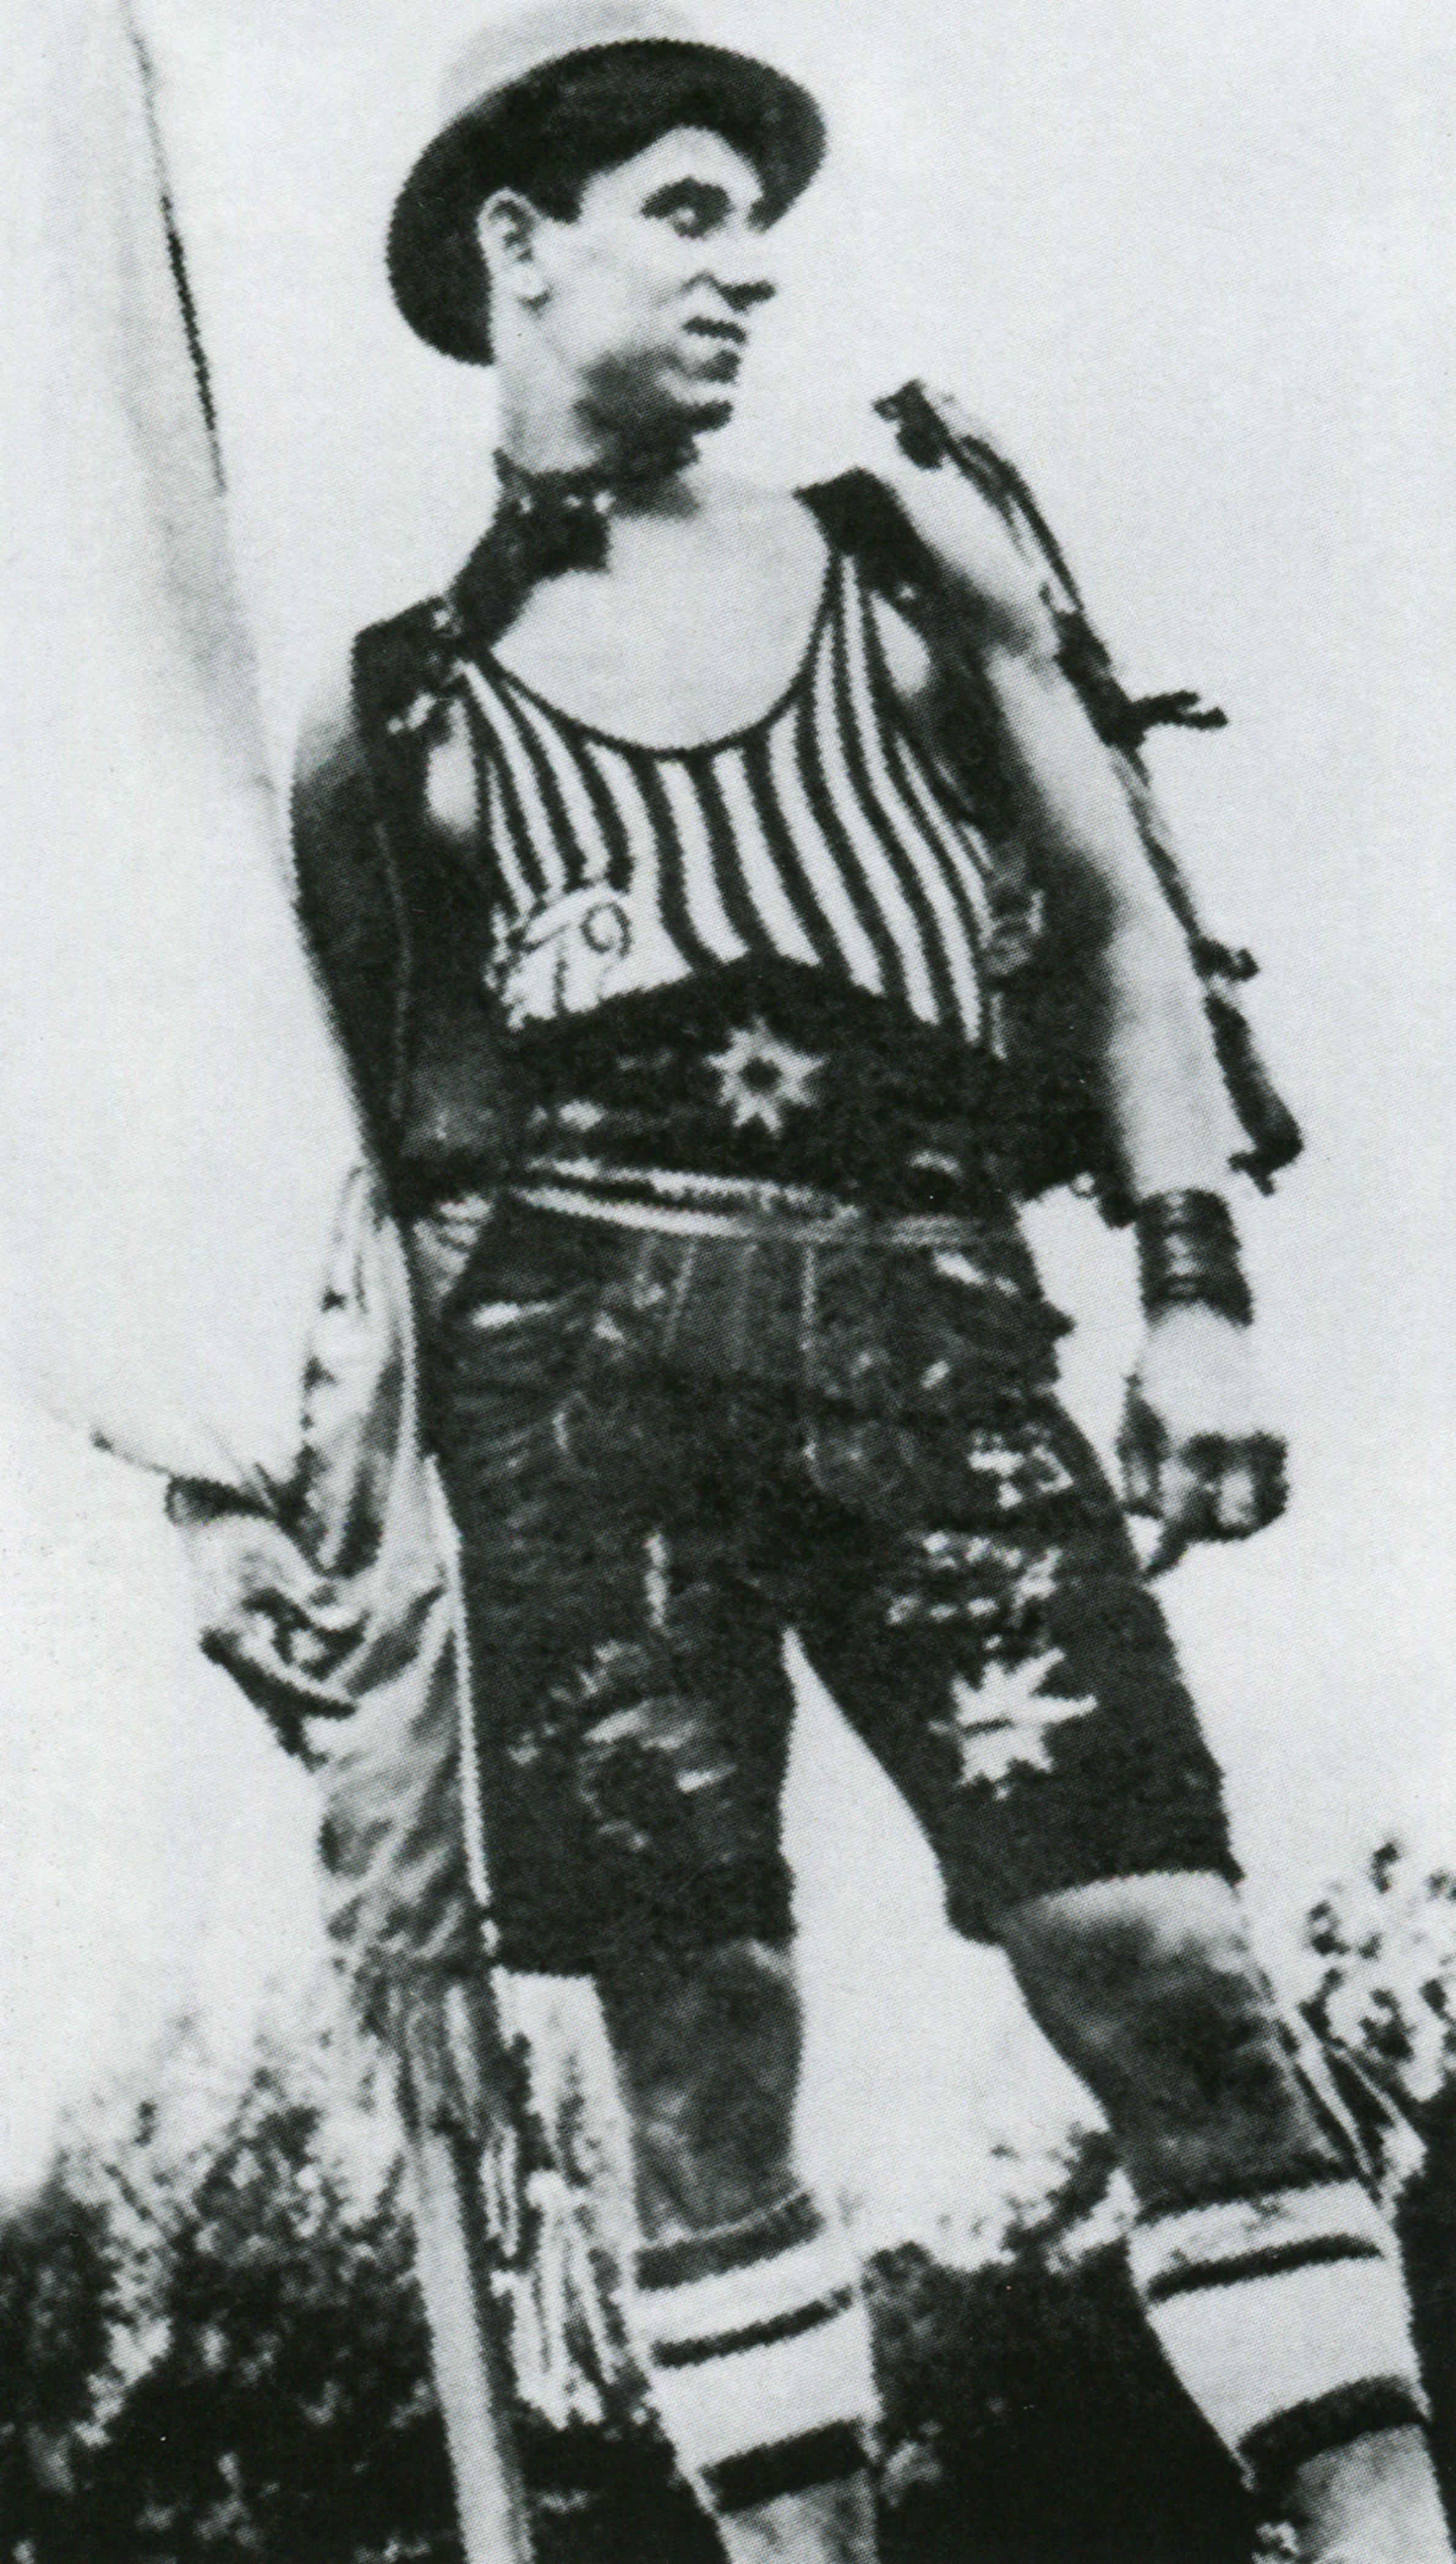 Winnetou, líder de los Wild Boys